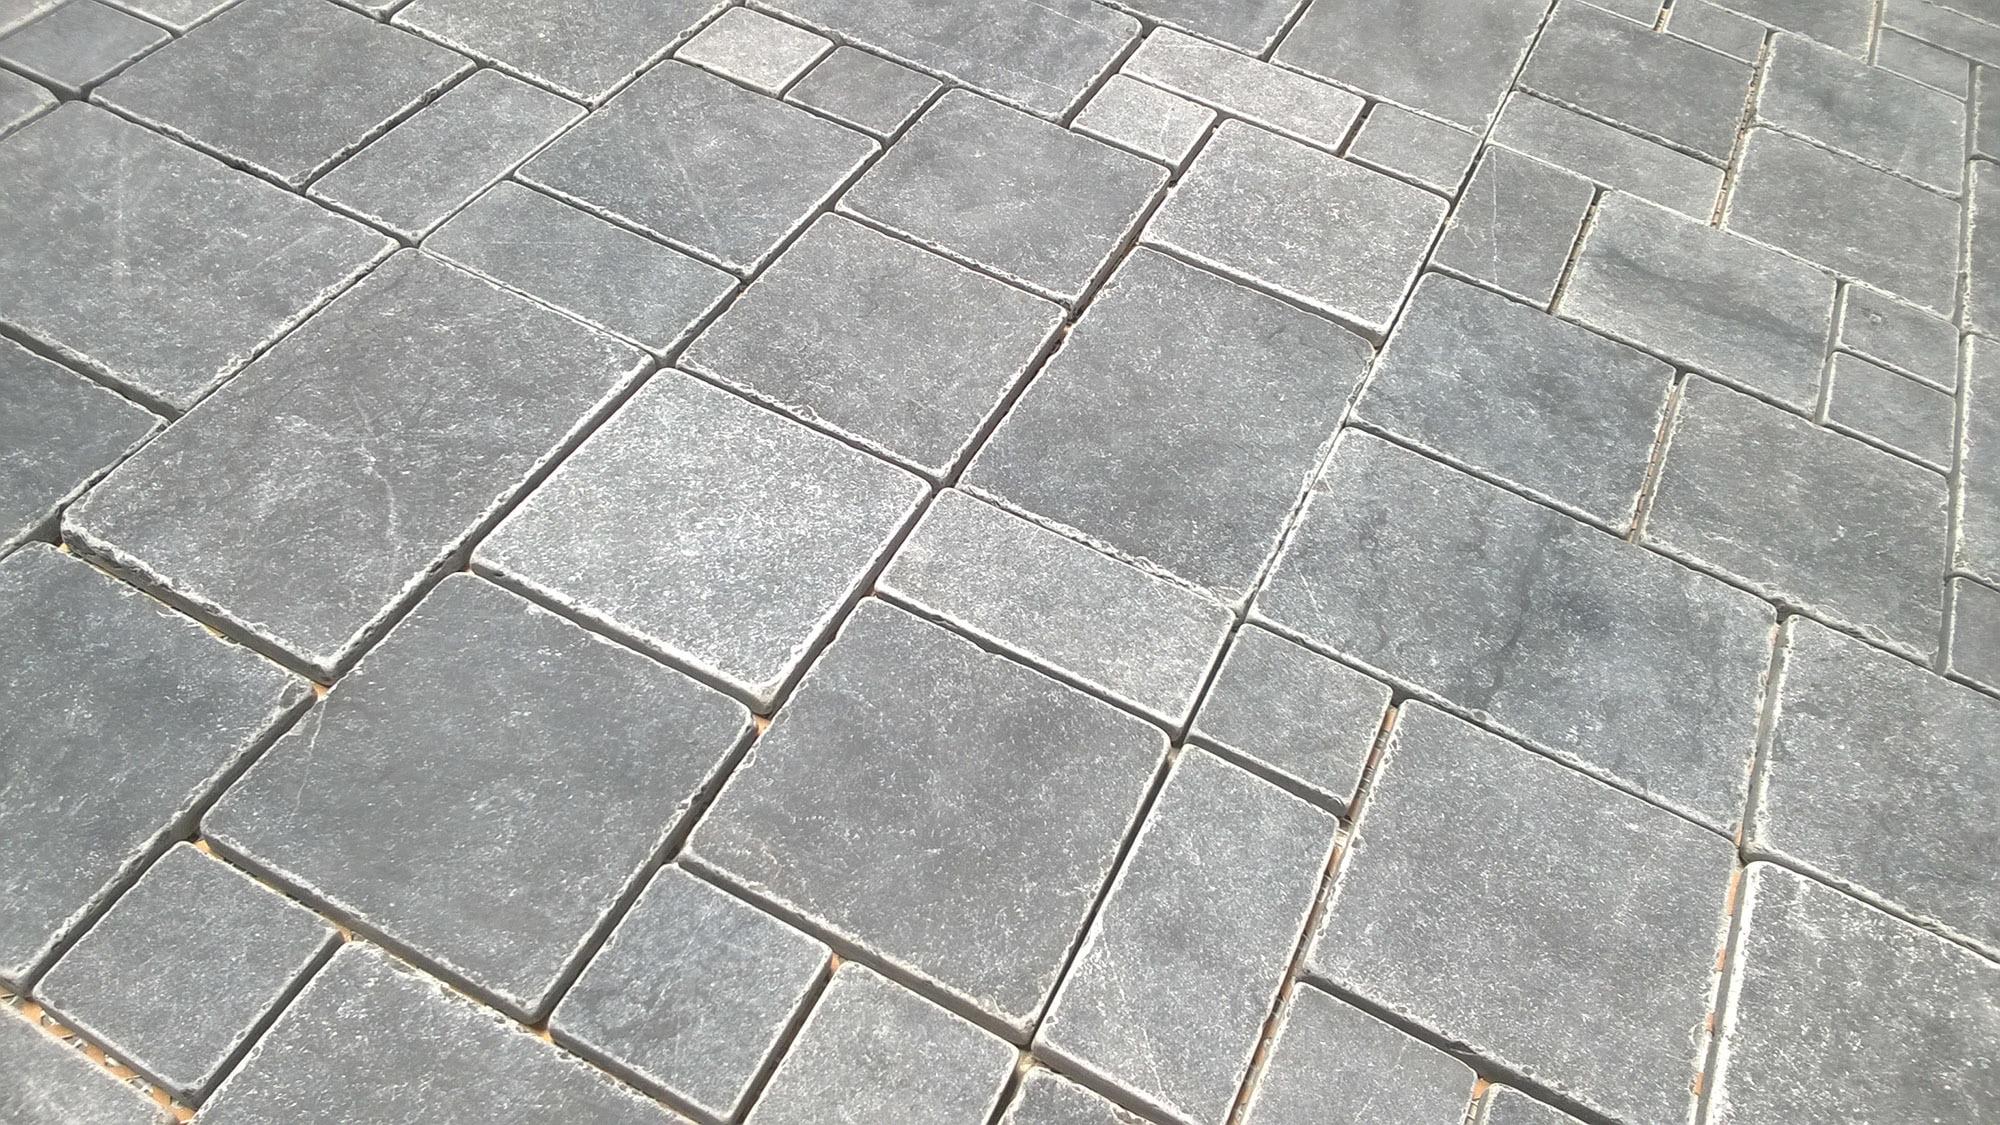 Pedra mosaic tile vina collection bluestone romano limestone pedra mosaic tile vina collection bluestone romano limestone french pattern honed dailygadgetfo Images